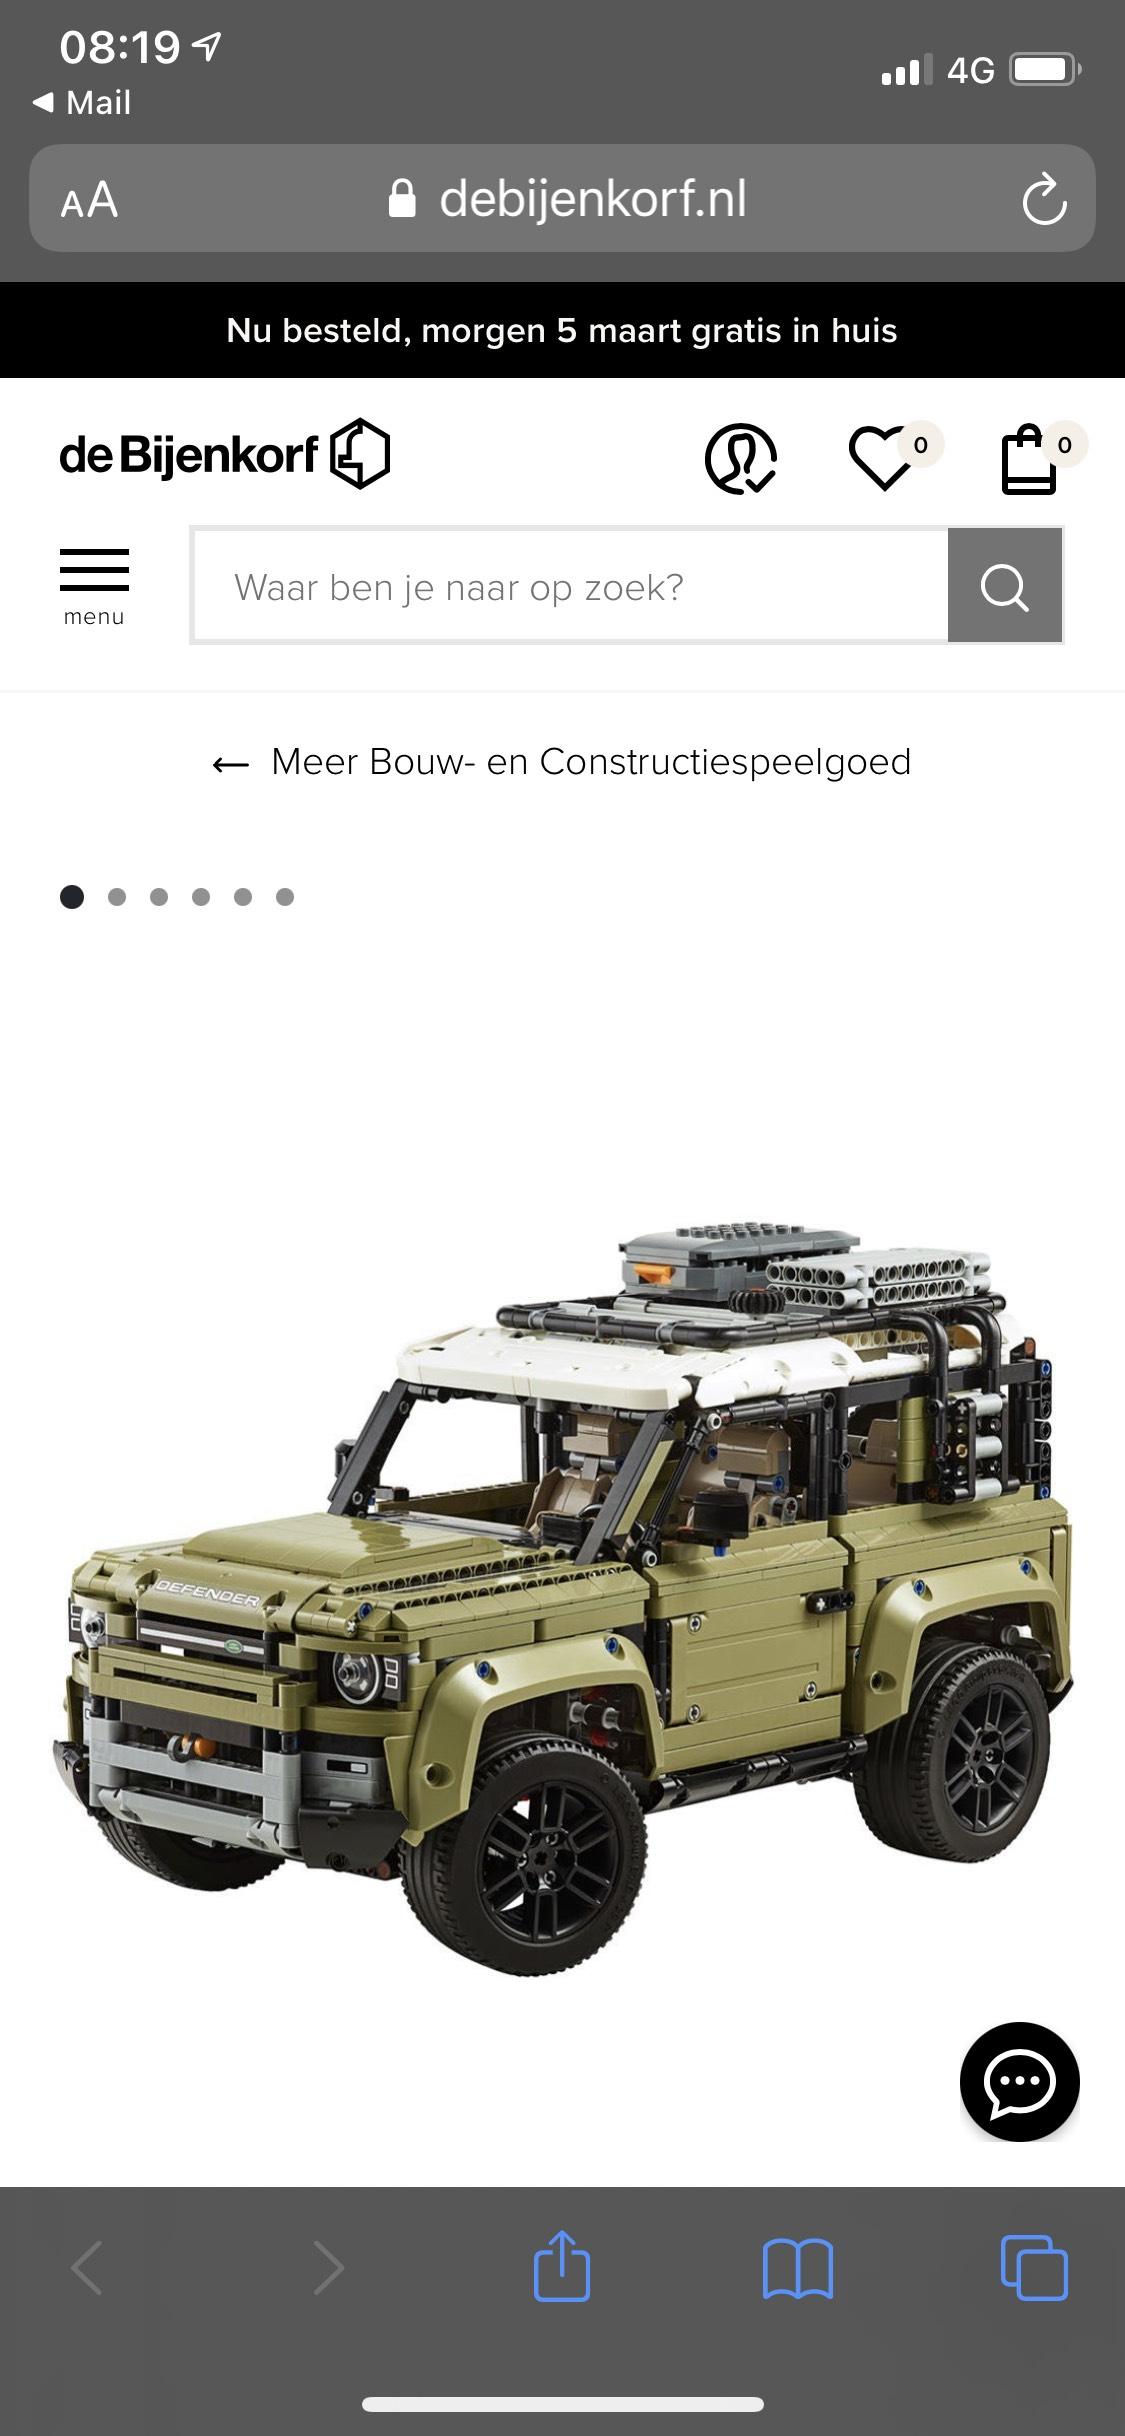 LEGO Technic Land Rover Defender - 42110 goedkoopste ooit! (ING punten nodig!)